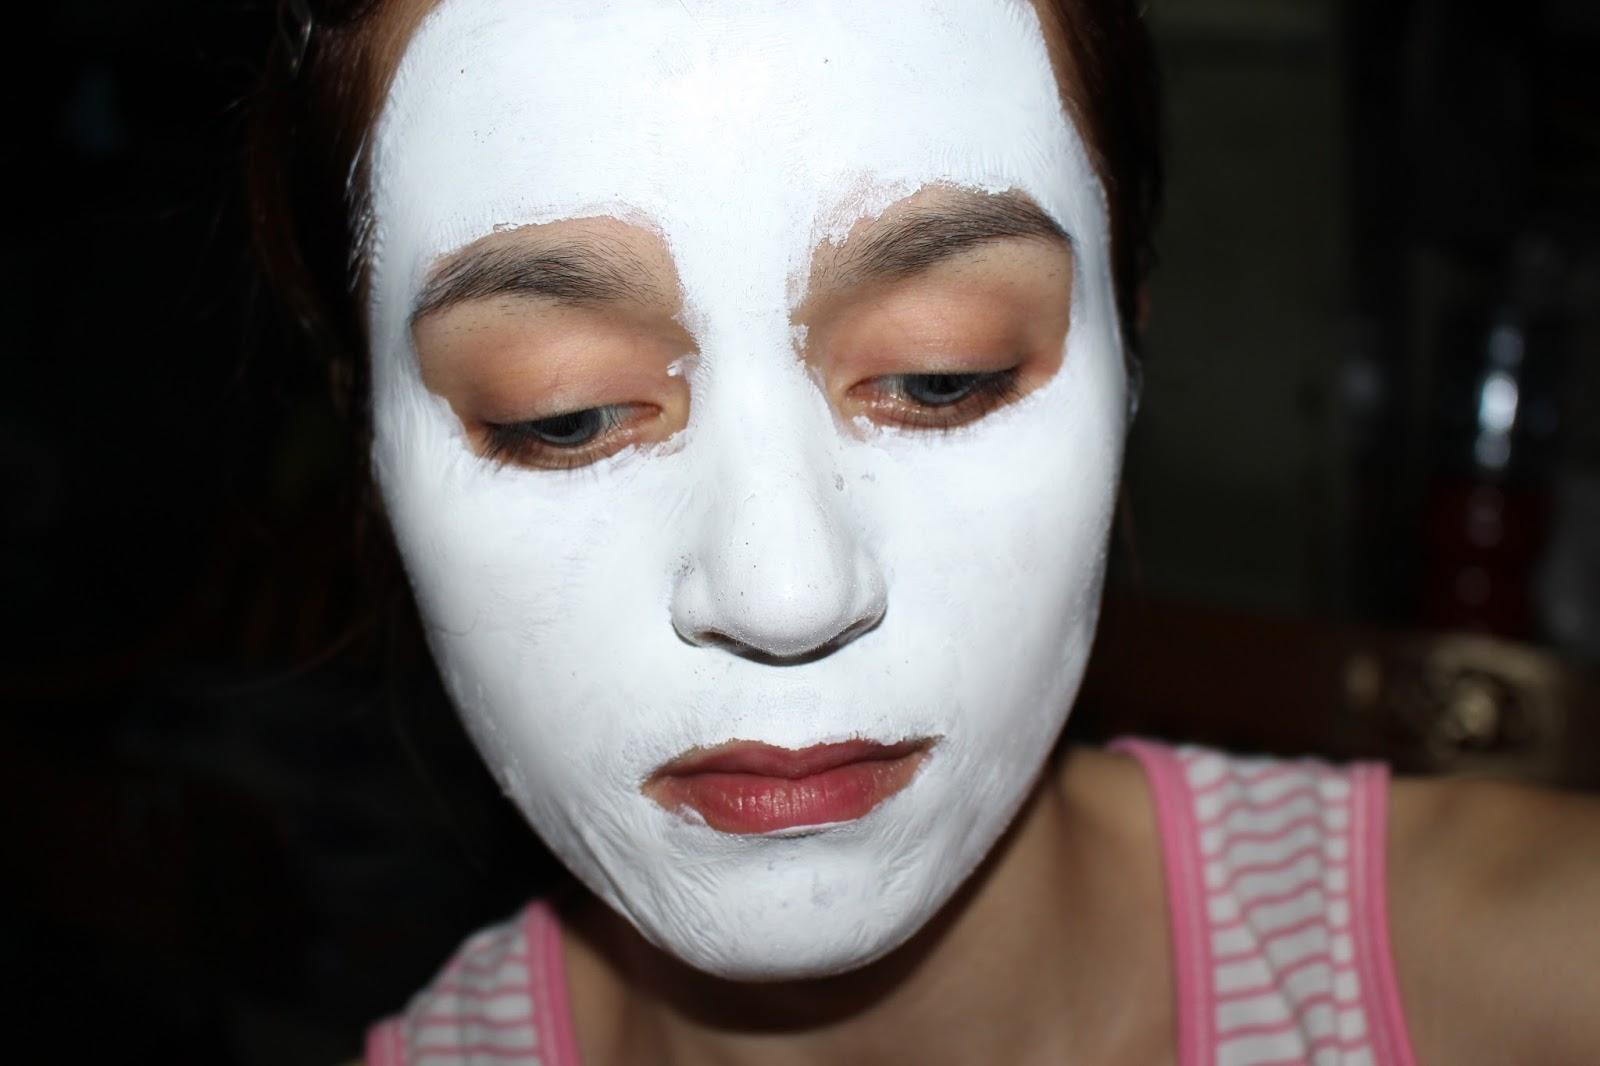 iwhite korea whitening mask peel off mask review bloominzahra. Black Bedroom Furniture Sets. Home Design Ideas